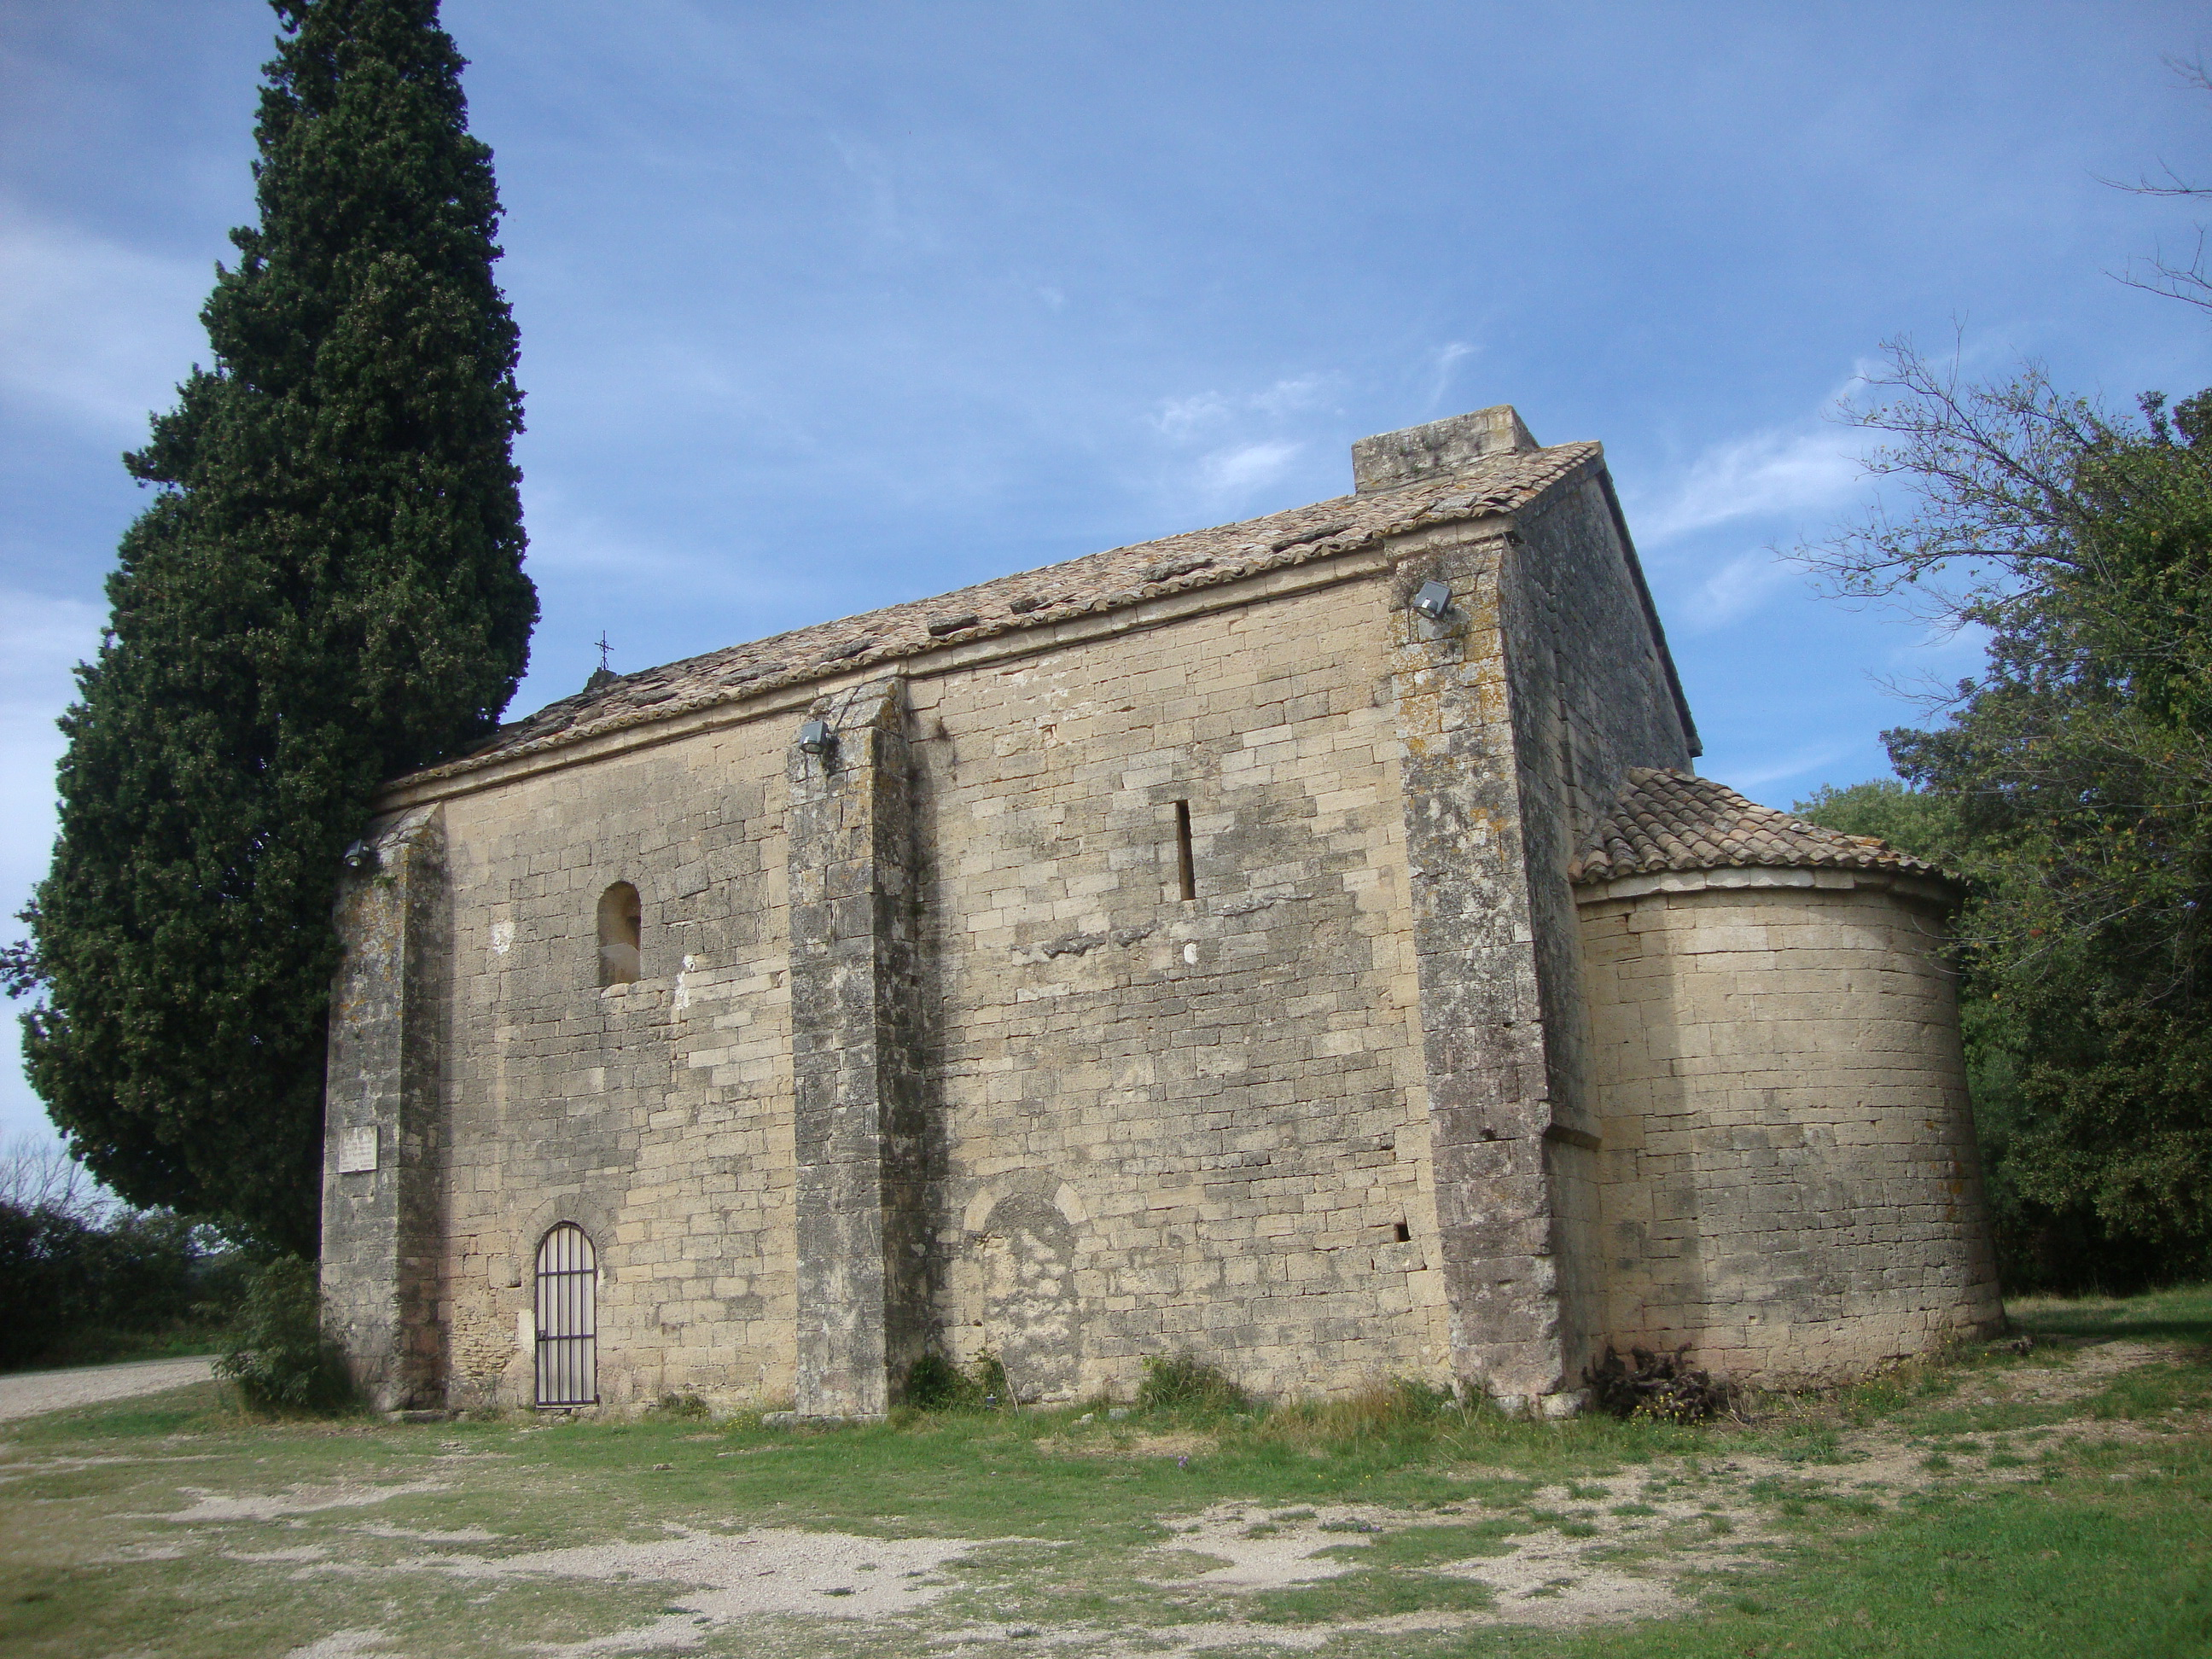 file chapelle saint caprais castillon du gard jpg wikimedia commons. Black Bedroom Furniture Sets. Home Design Ideas